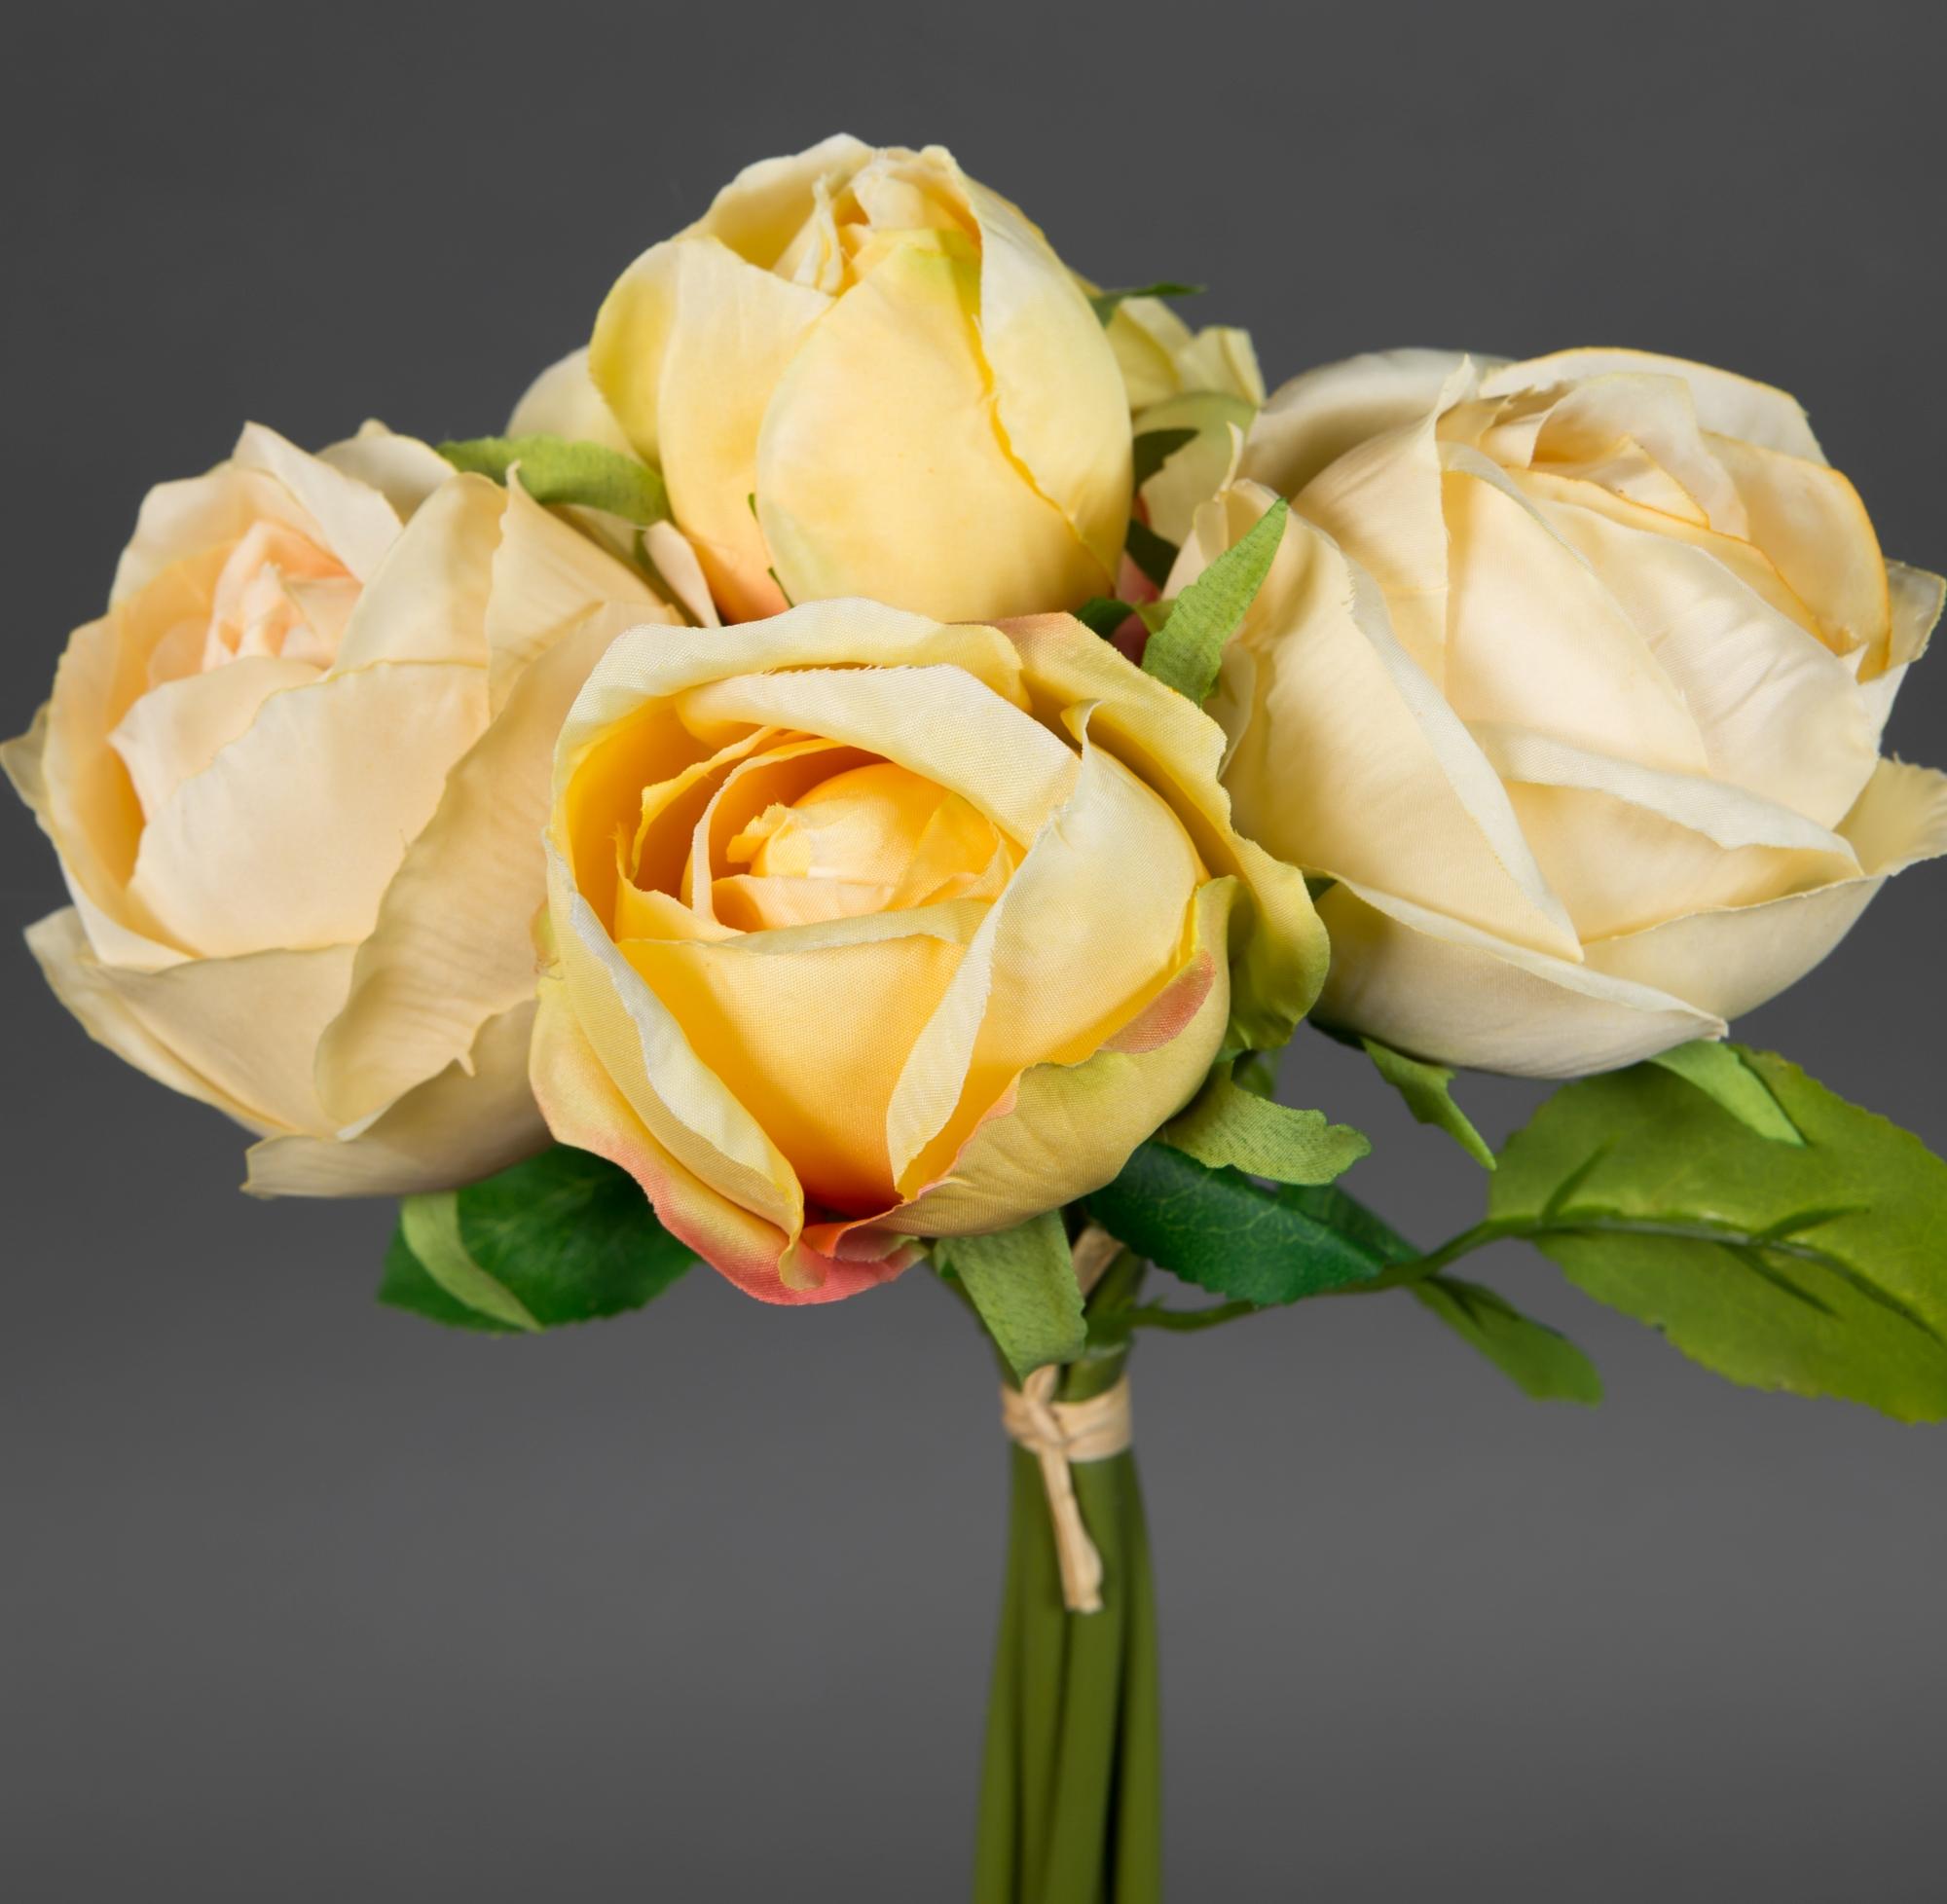 rosenstrau 28x20cm gelb salmon ft kunstblumen k nstliche rosen blumen strau blumenstrau. Black Bedroom Furniture Sets. Home Design Ideas